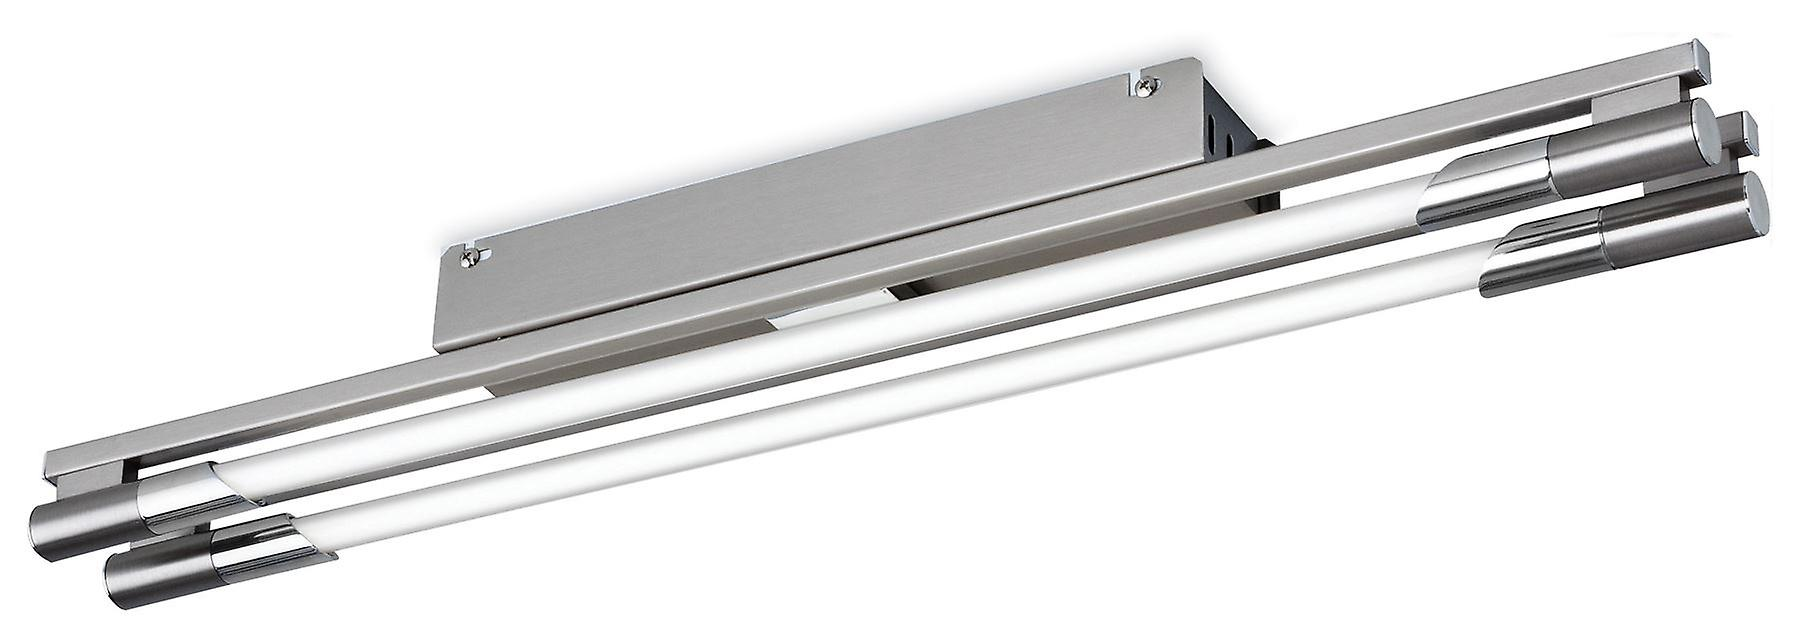 Firstlumière - 2 lumière Flush lumière Brushed Steel - 2338BS